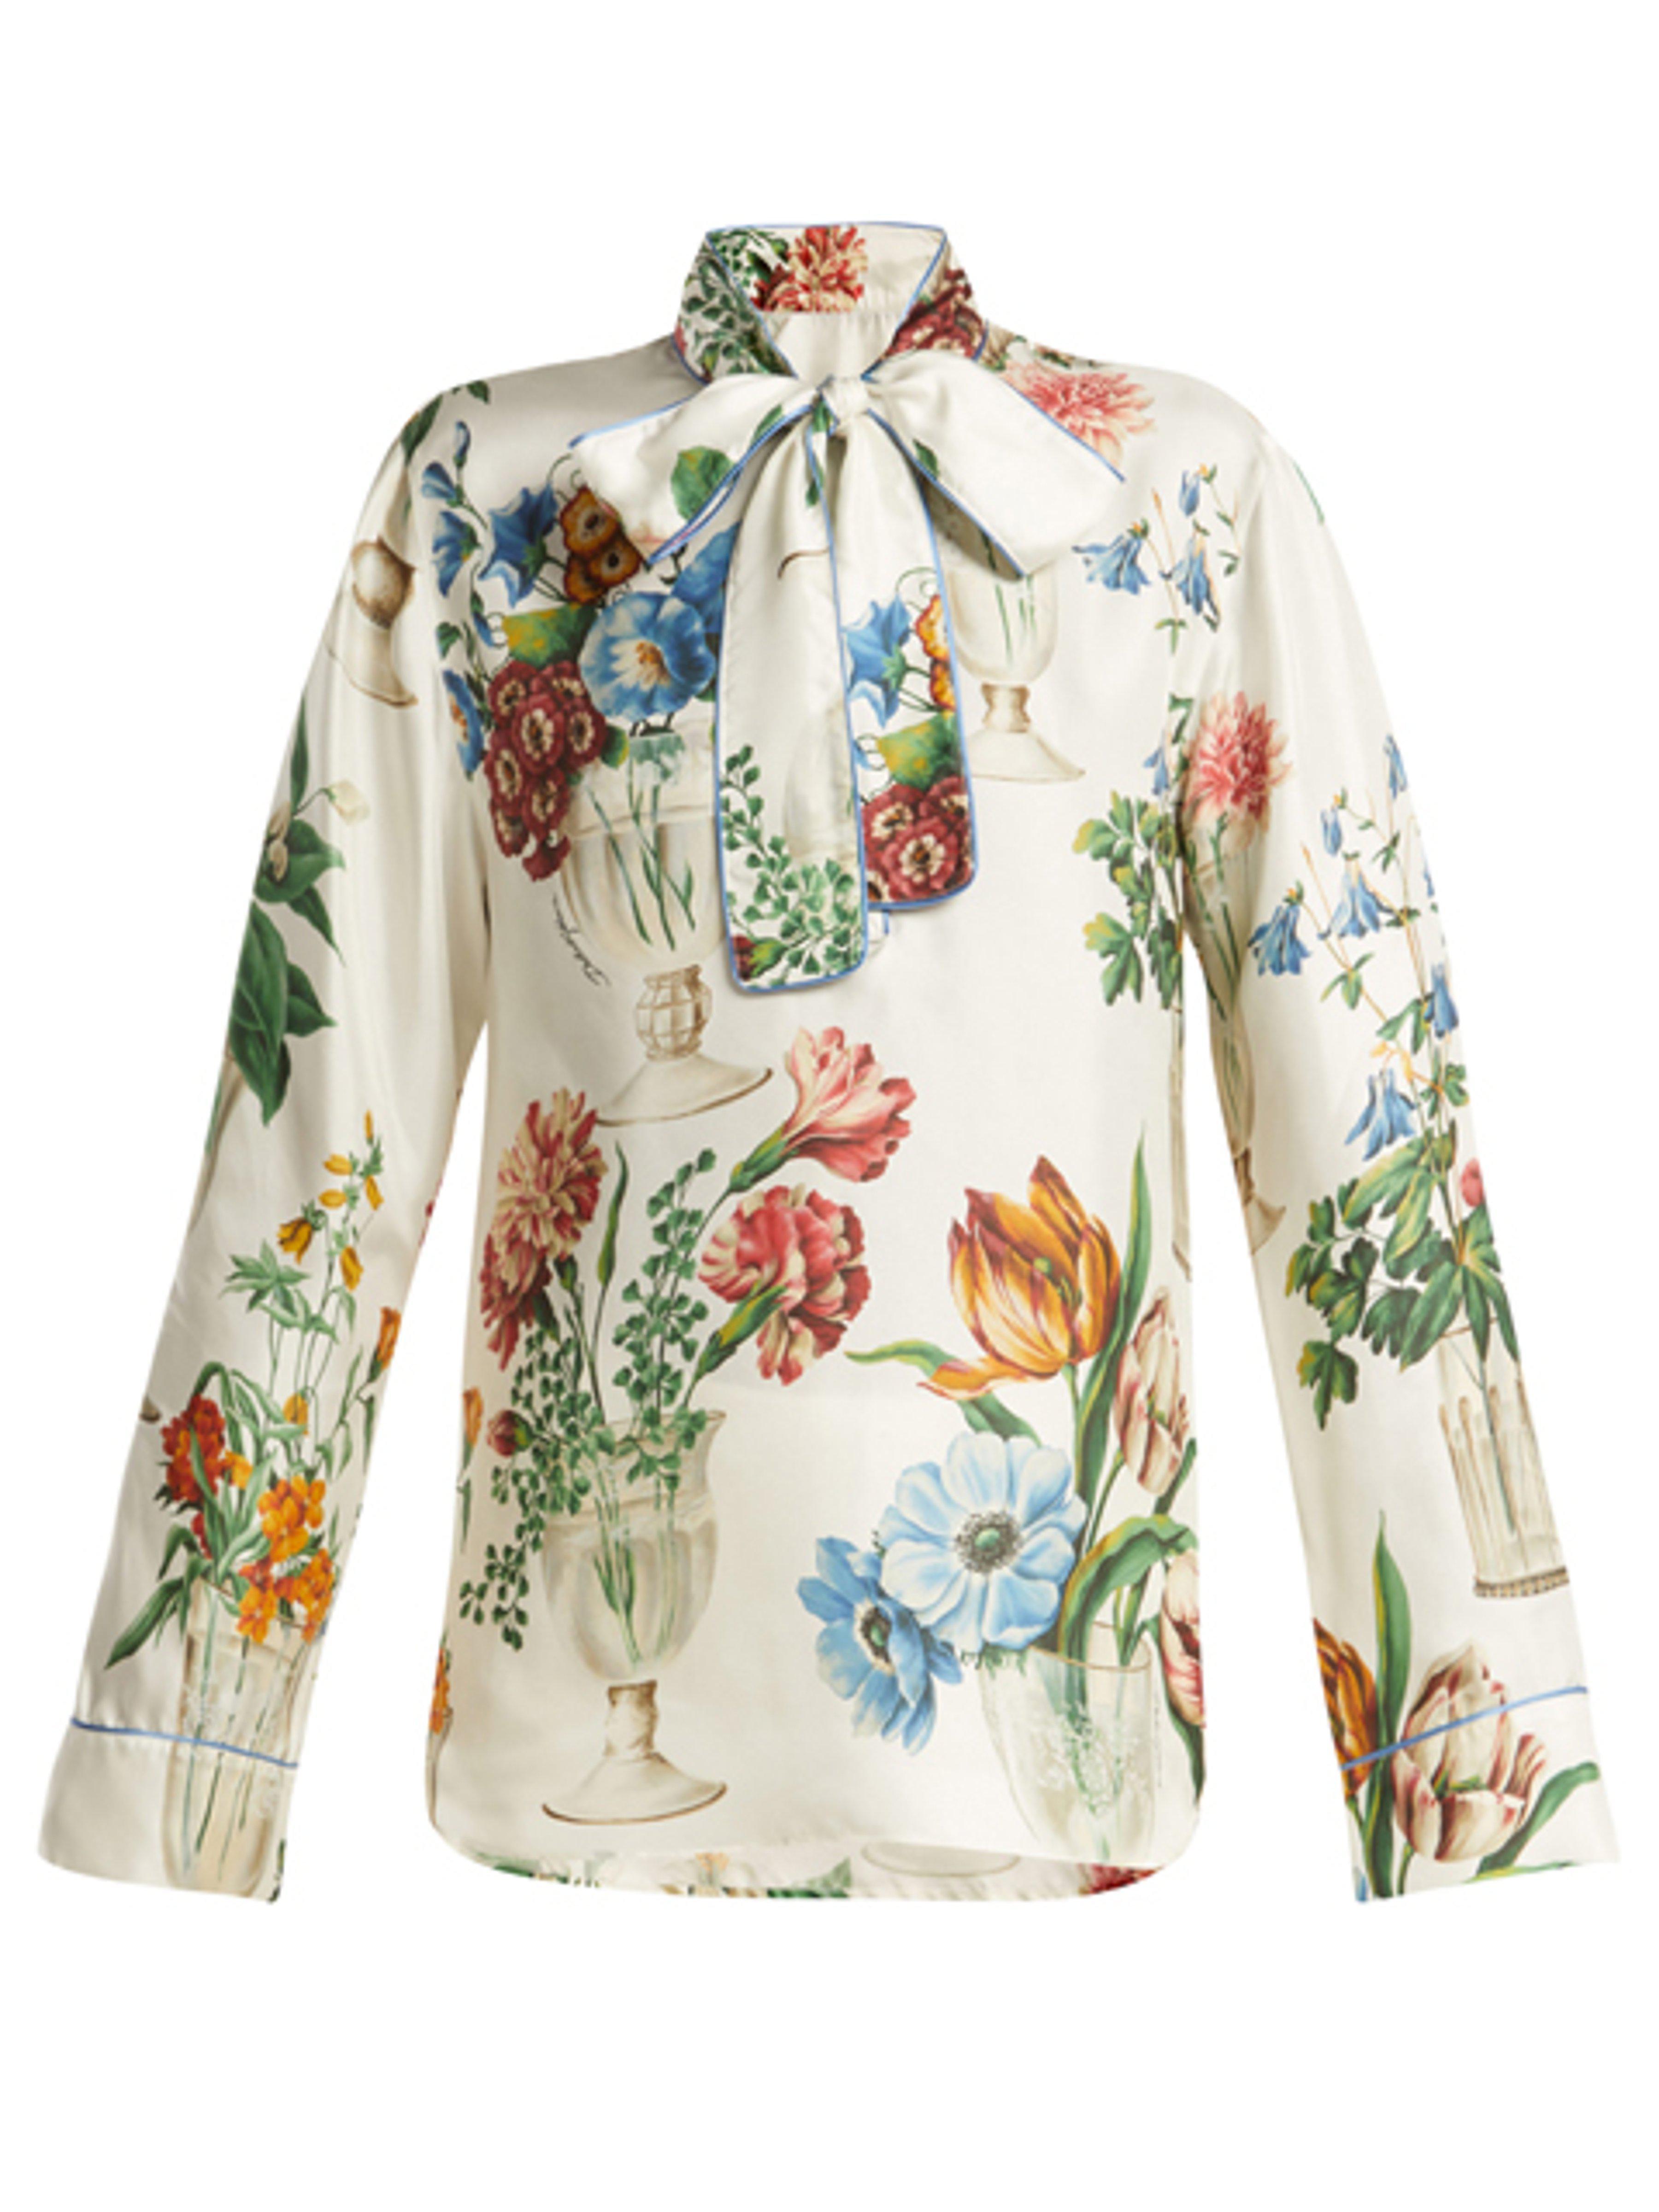 e5da8a816e63ee Dolce   Gabbana Floral And Vase Print Silk Blouse - Lyst